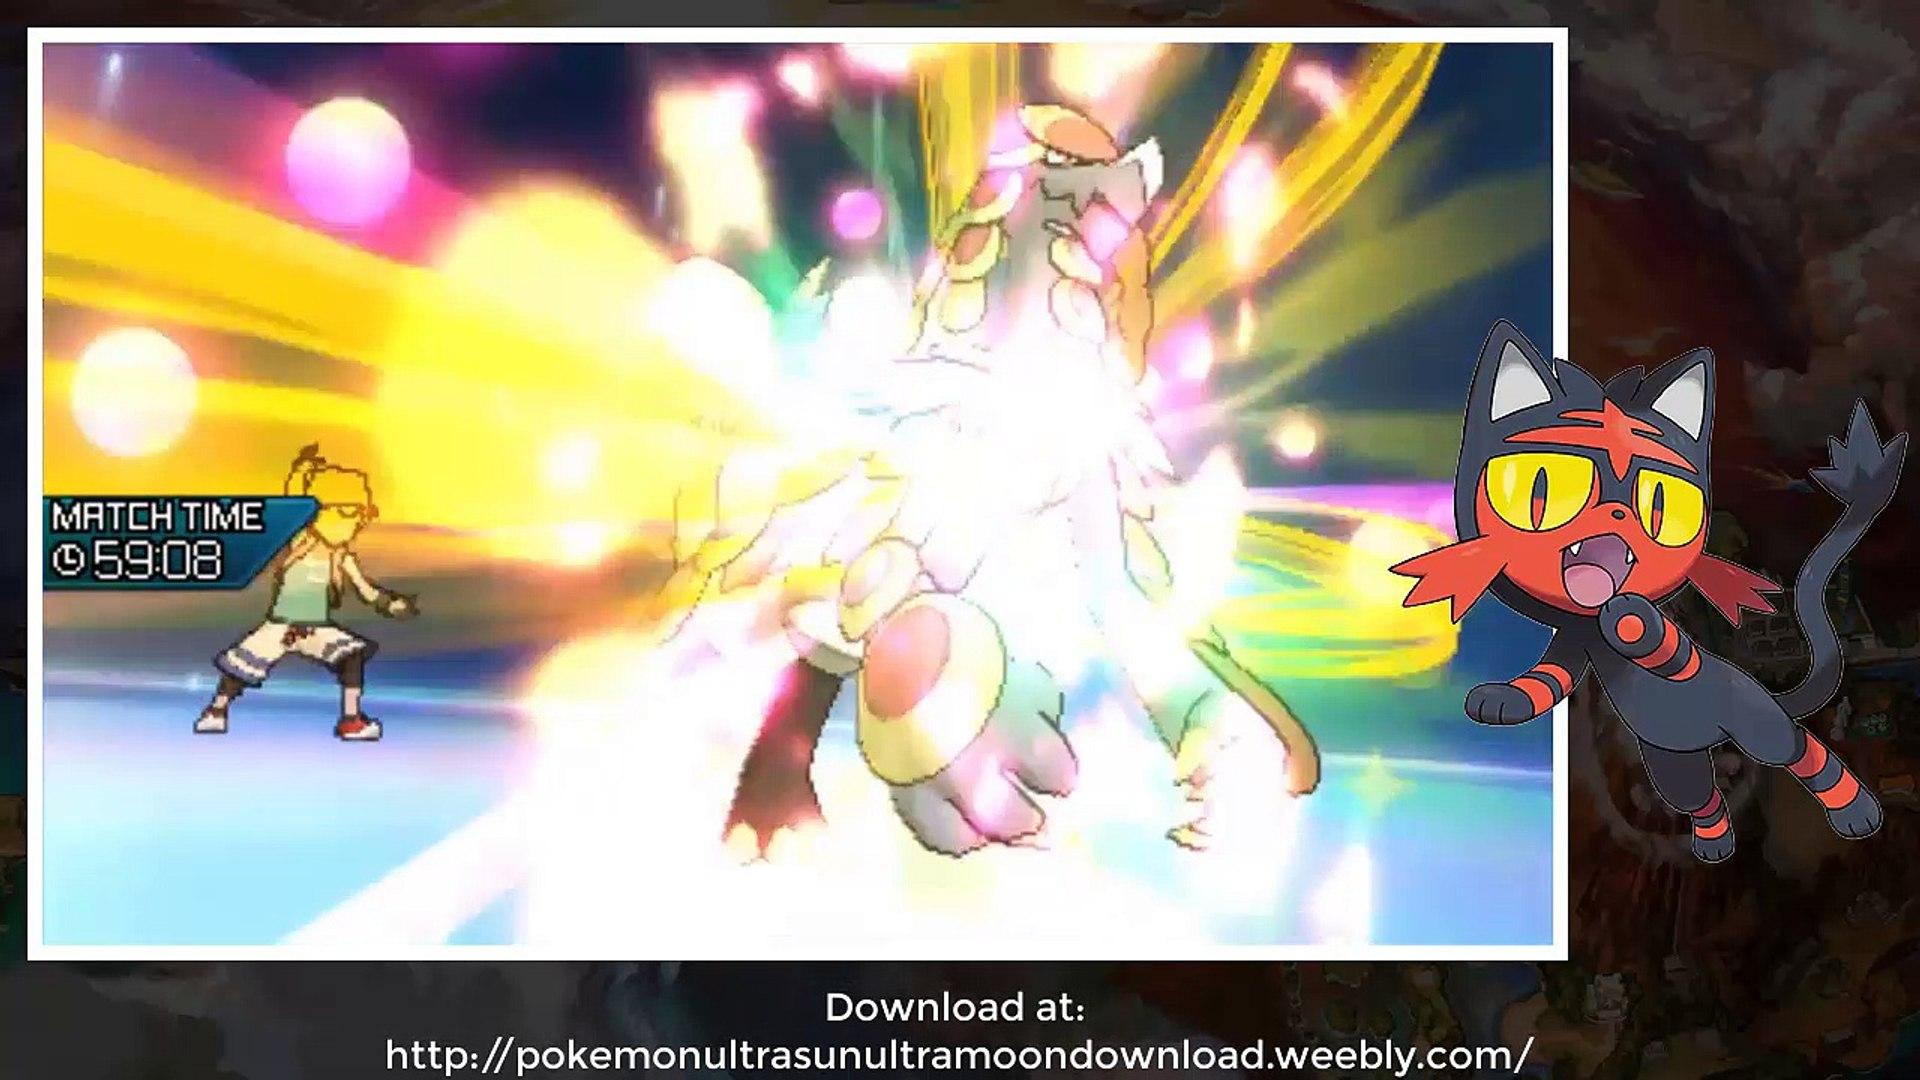 Pokémon Ultra Sun and Pokémon Ultra Moon Download